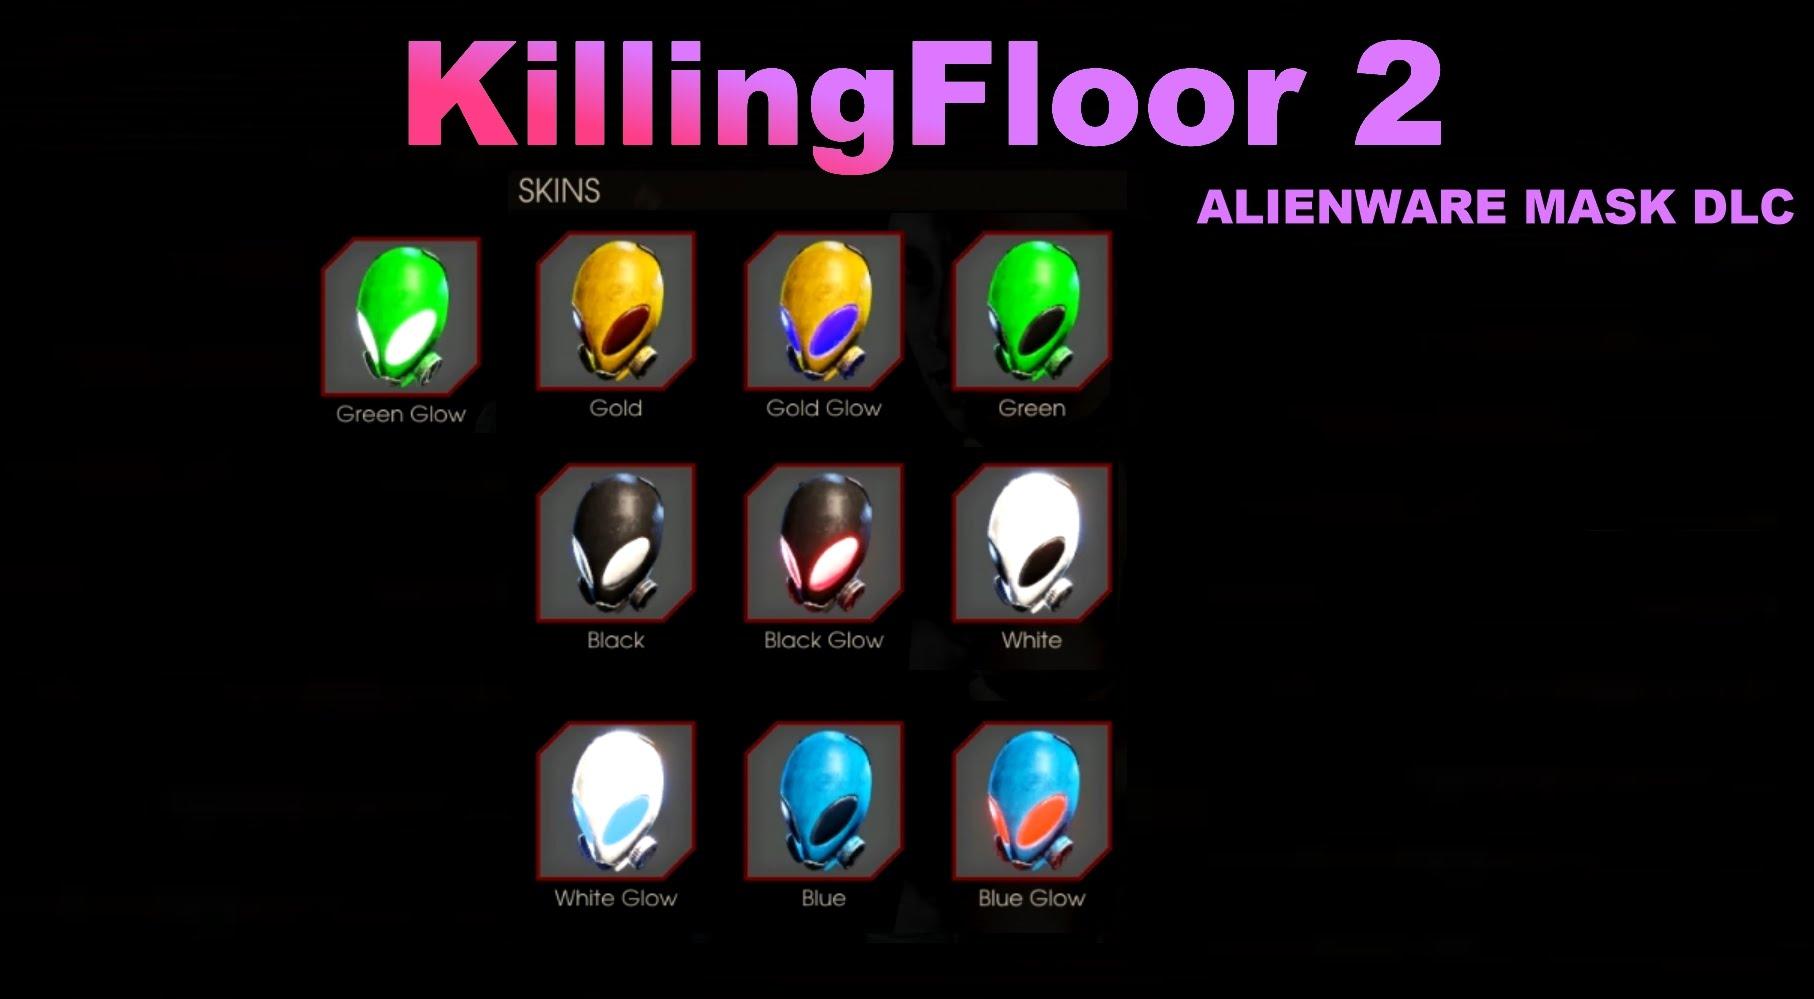 Buy Killing Floor 2 Alienware Mask Dlc Steam Key And